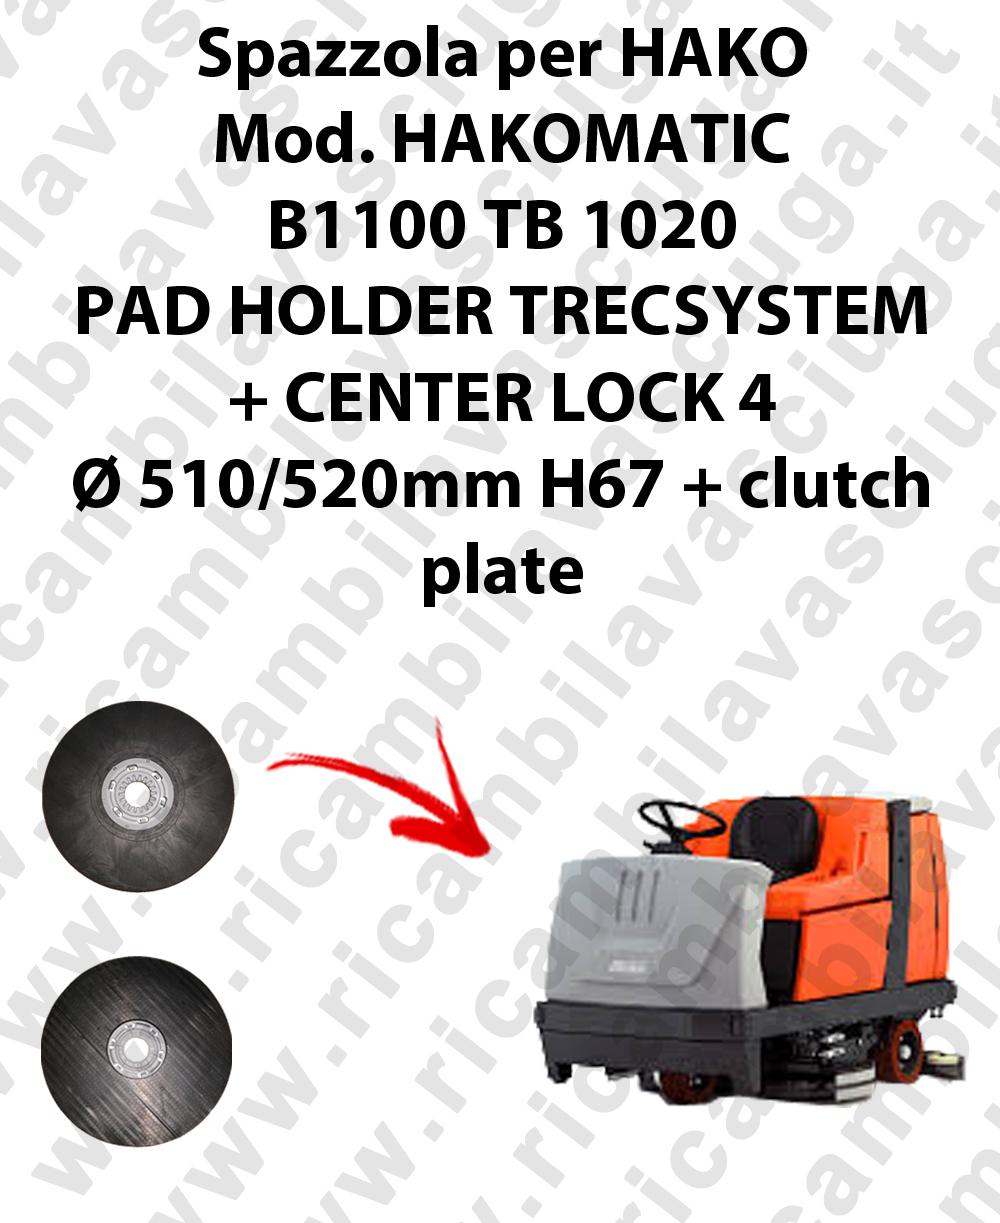 PAD HOLDER TRECSYSTEM  per lavapavimenti HAKO modello HAKOMATIC B1100 TB 1020